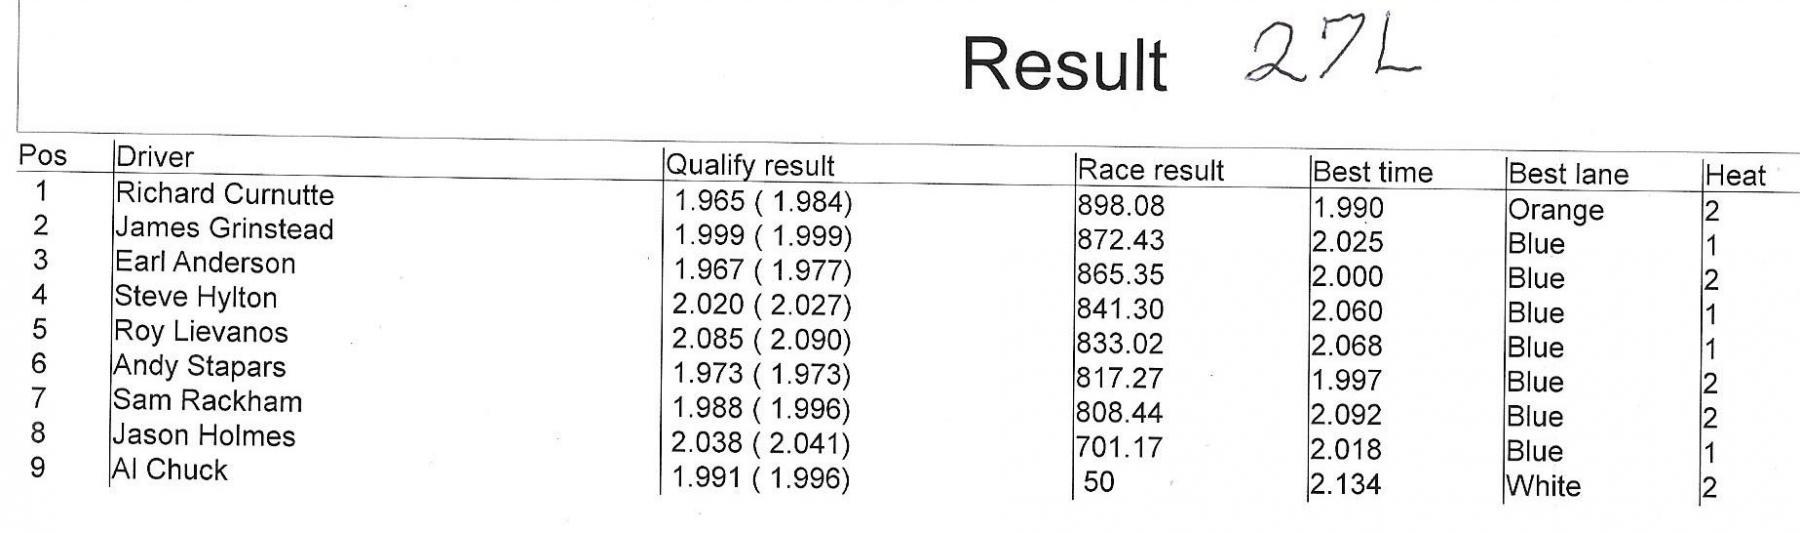 3820 27lite results.jpeg